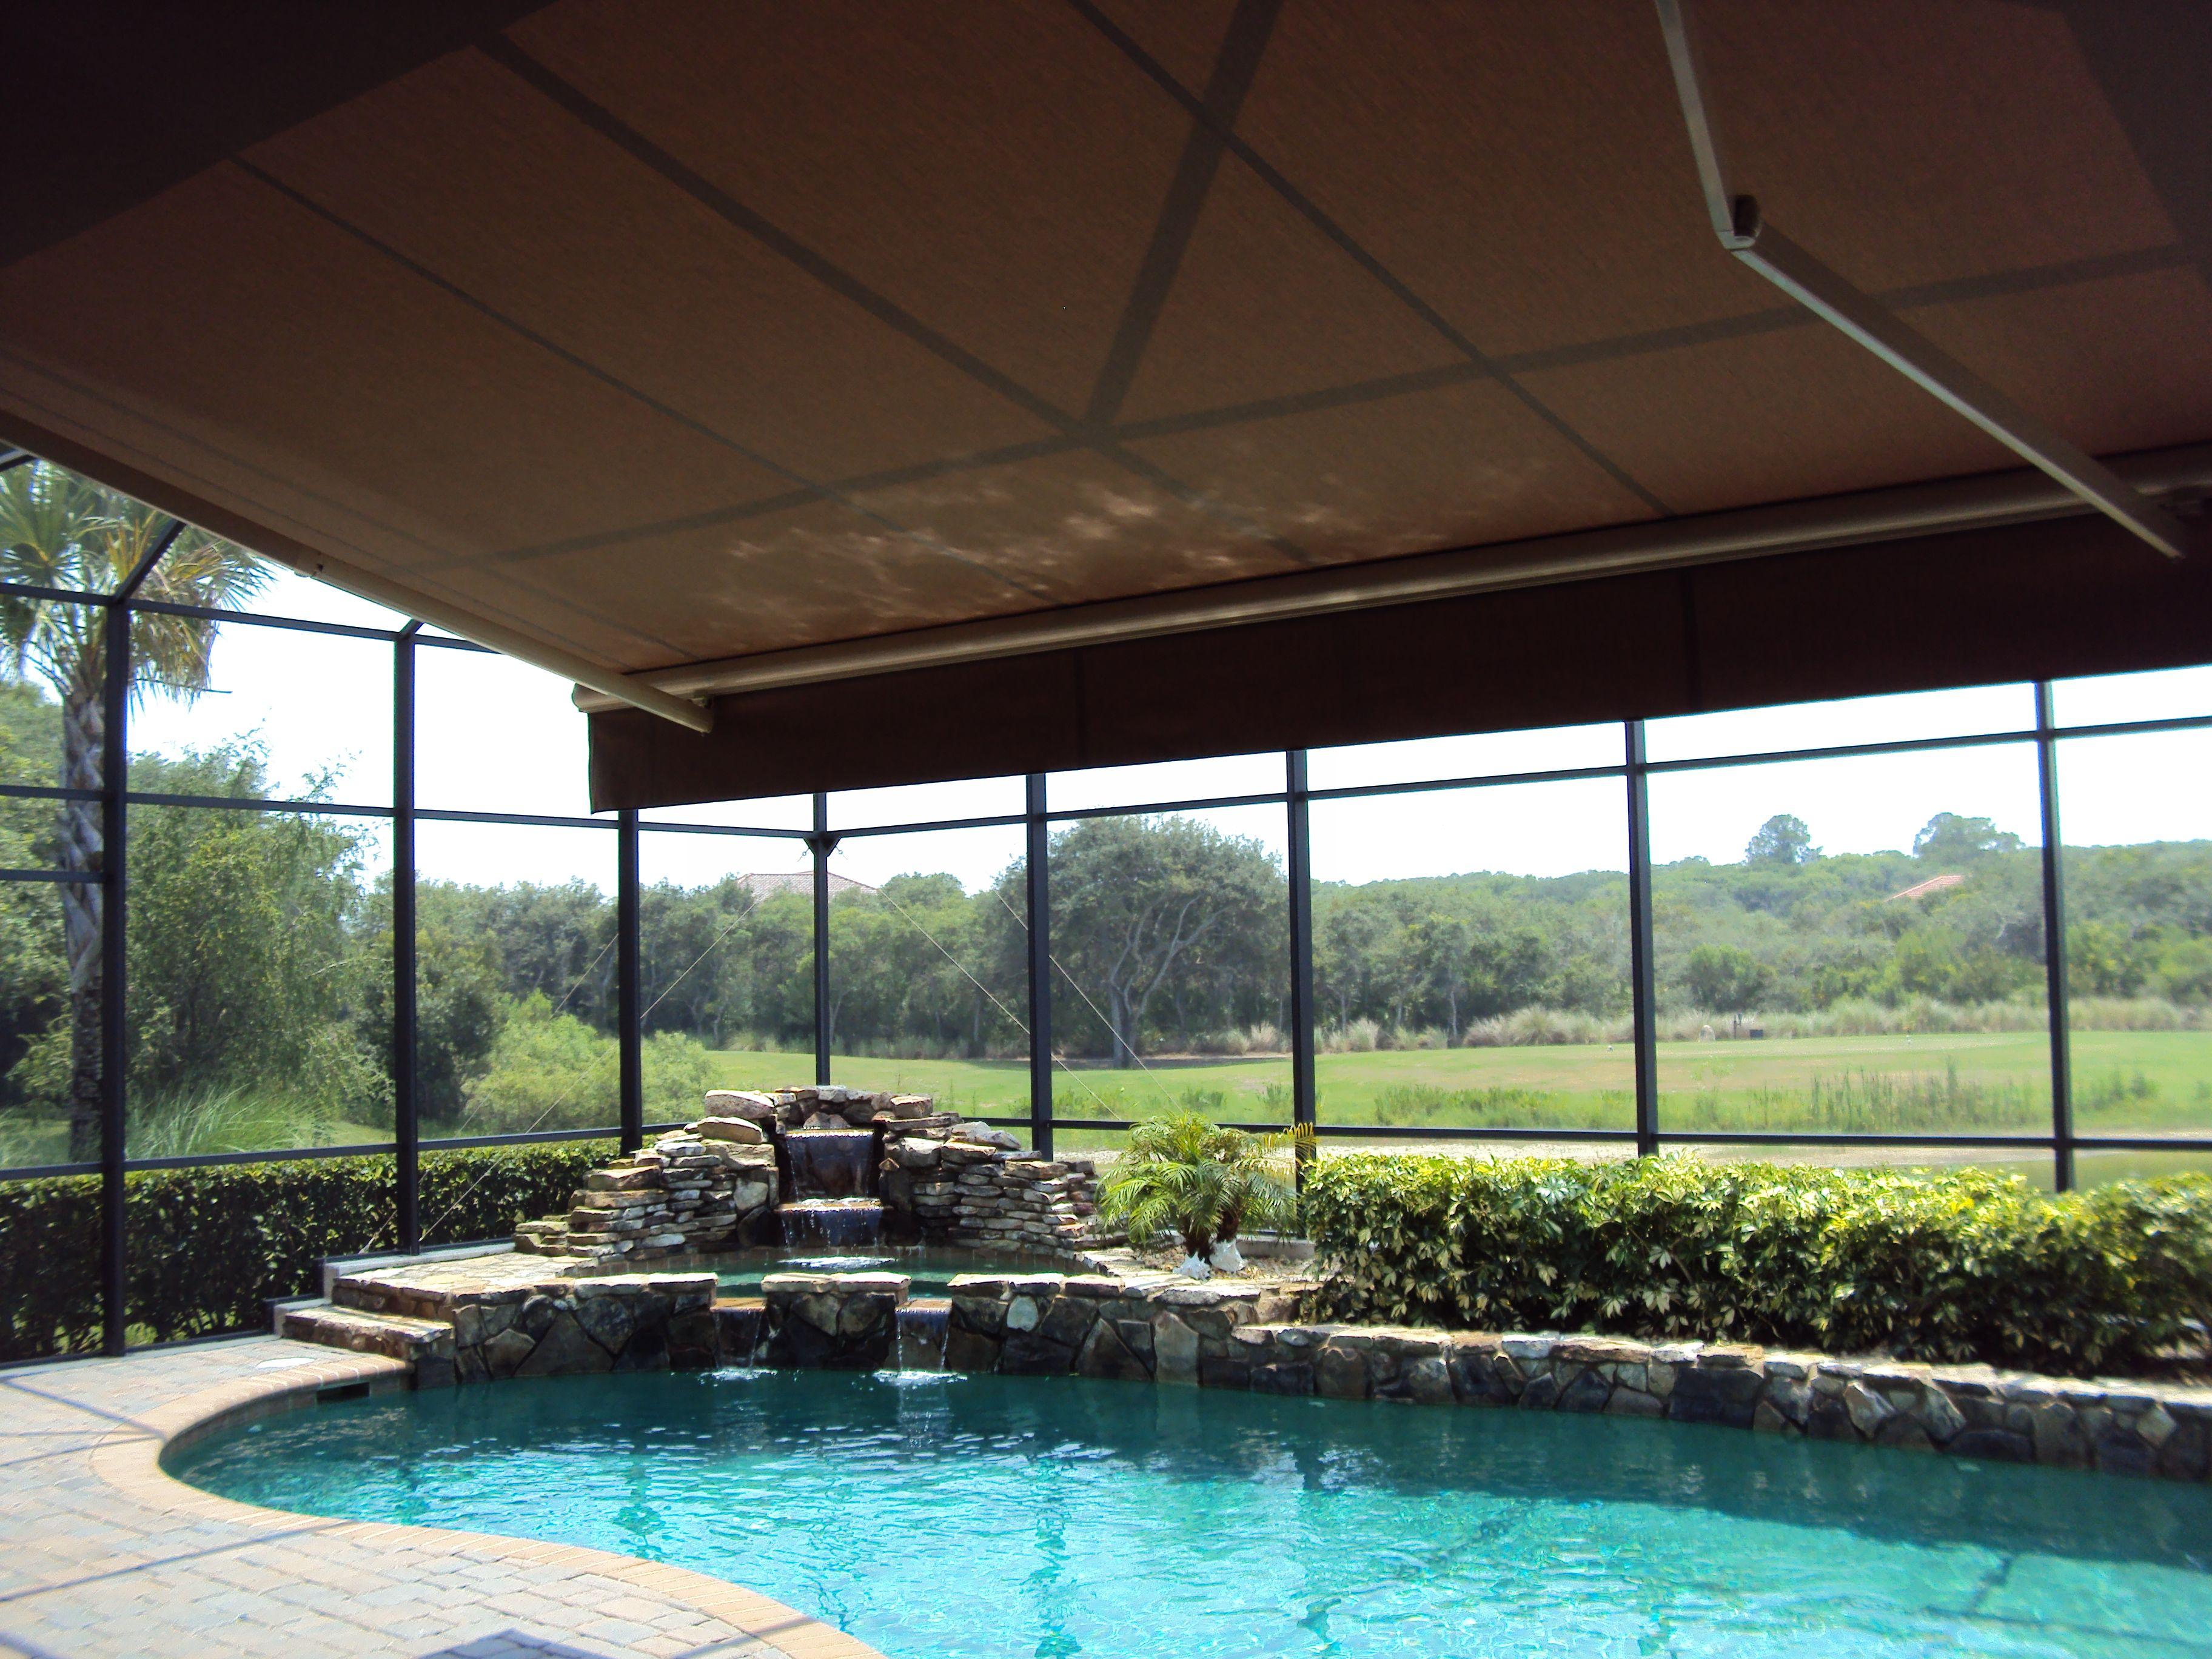 Patio Shades Pool Shade Pool Enclosures Screened Pool